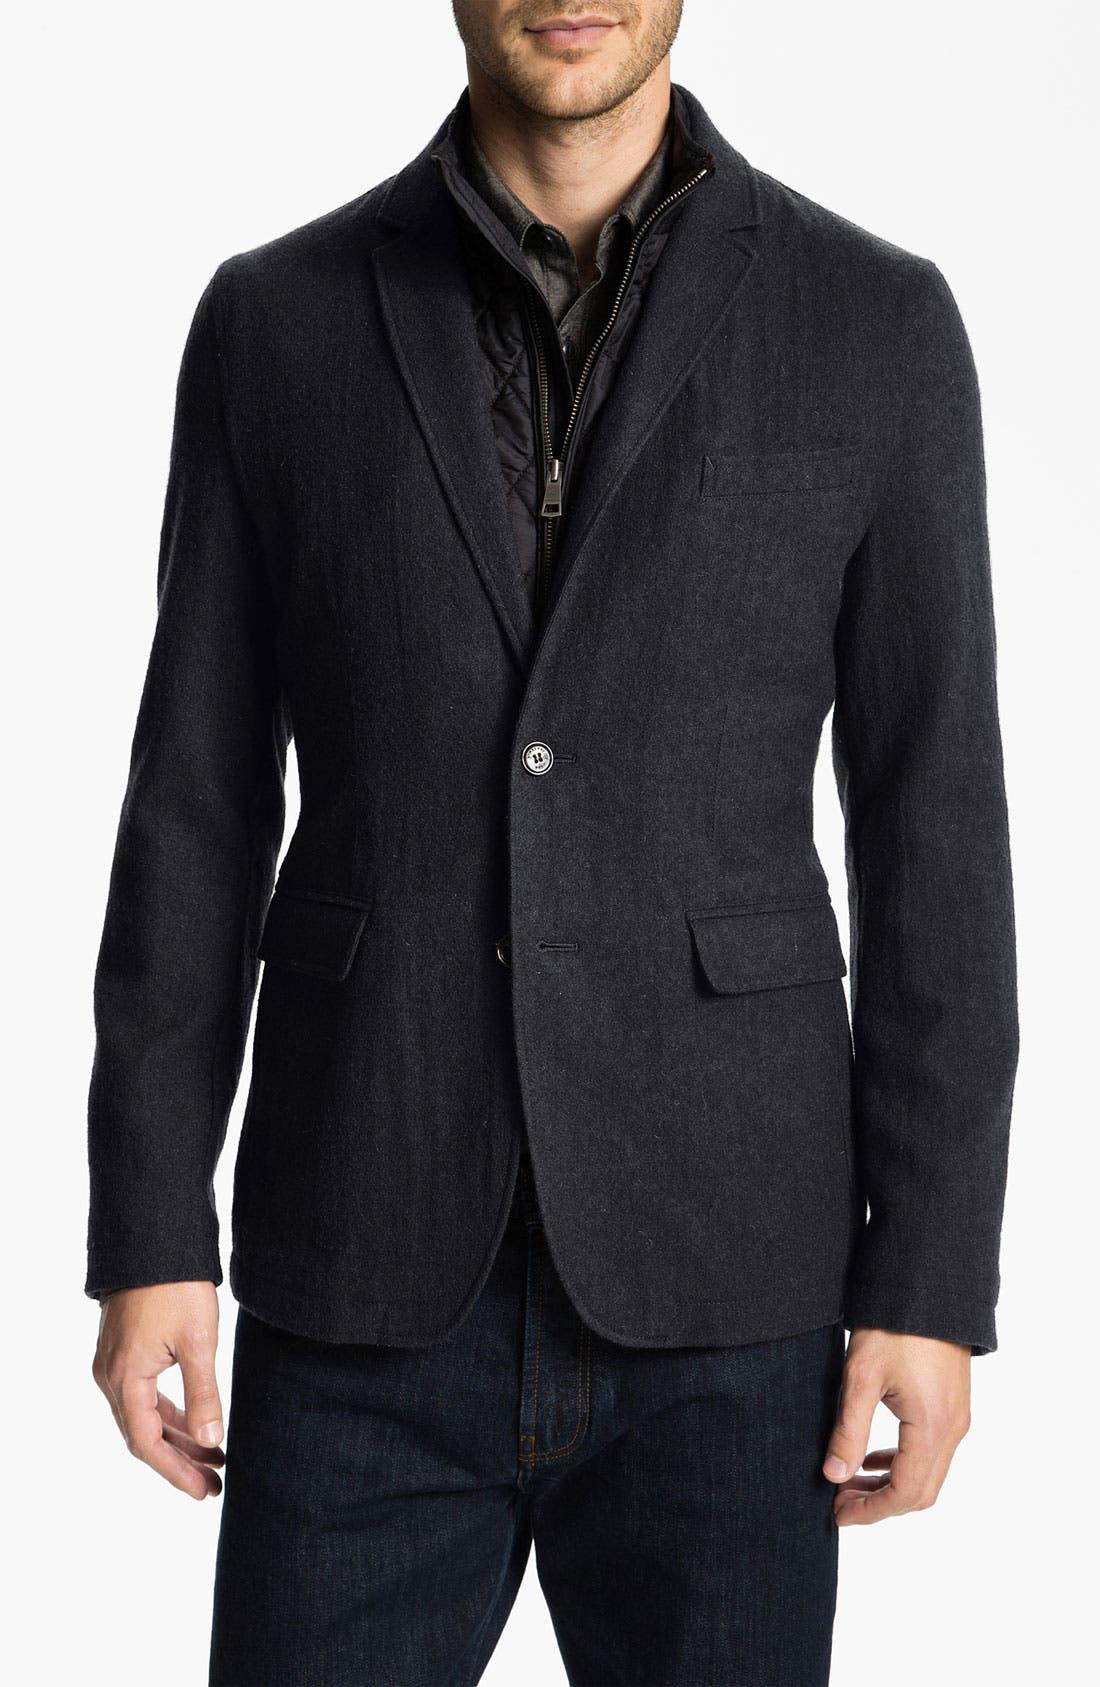 Alternate Image 1 Selected - Burberry Brit Wool Blend Trim Fit Jacket